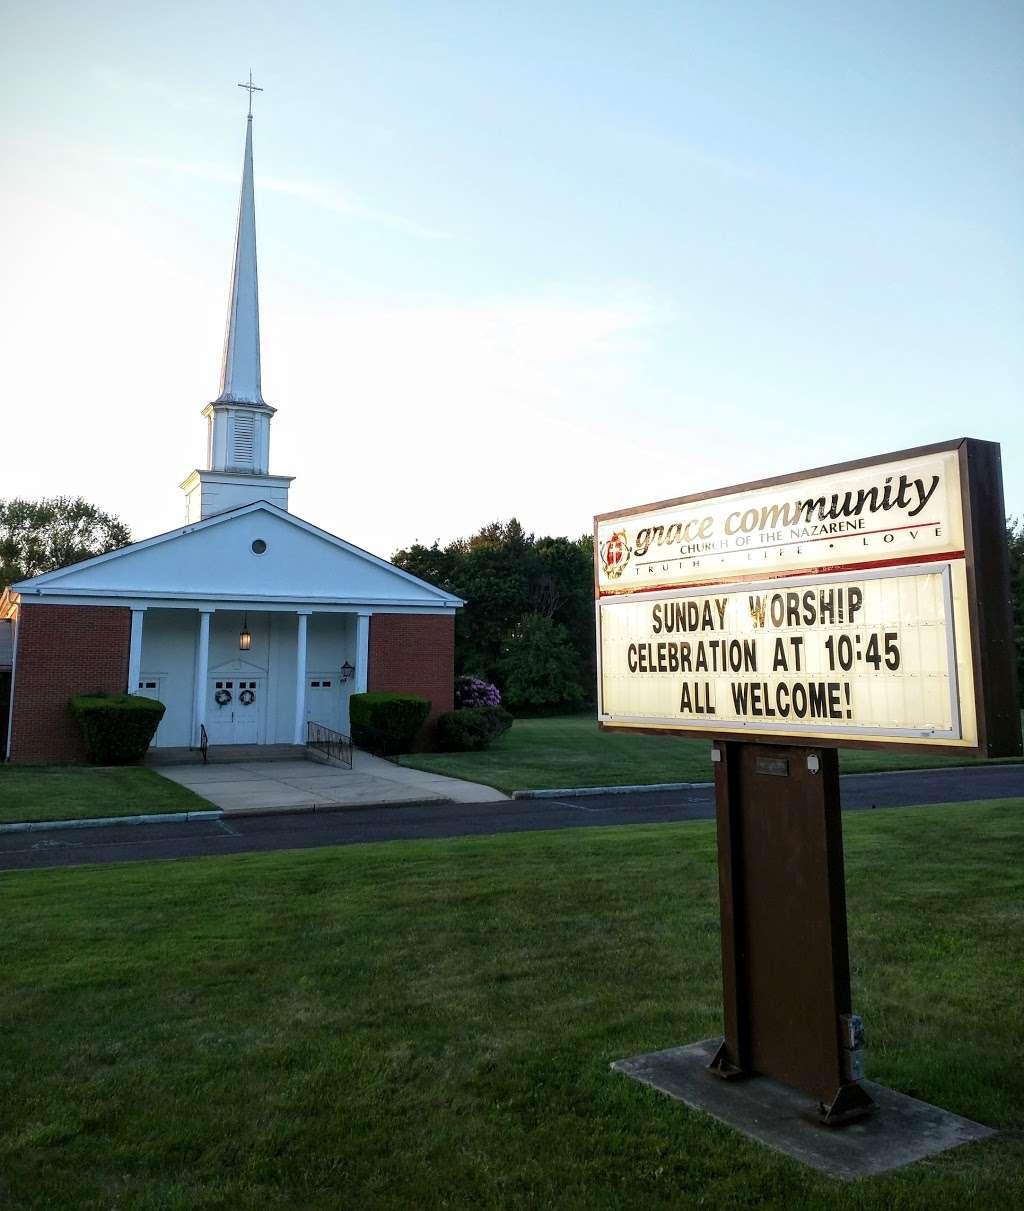 Grace Community Church of the Nazarene - church  | Photo 9 of 9 | Address: 100 Bull Run Rd, Ewing Township, NJ 08638, USA | Phone: (609) 737-3184